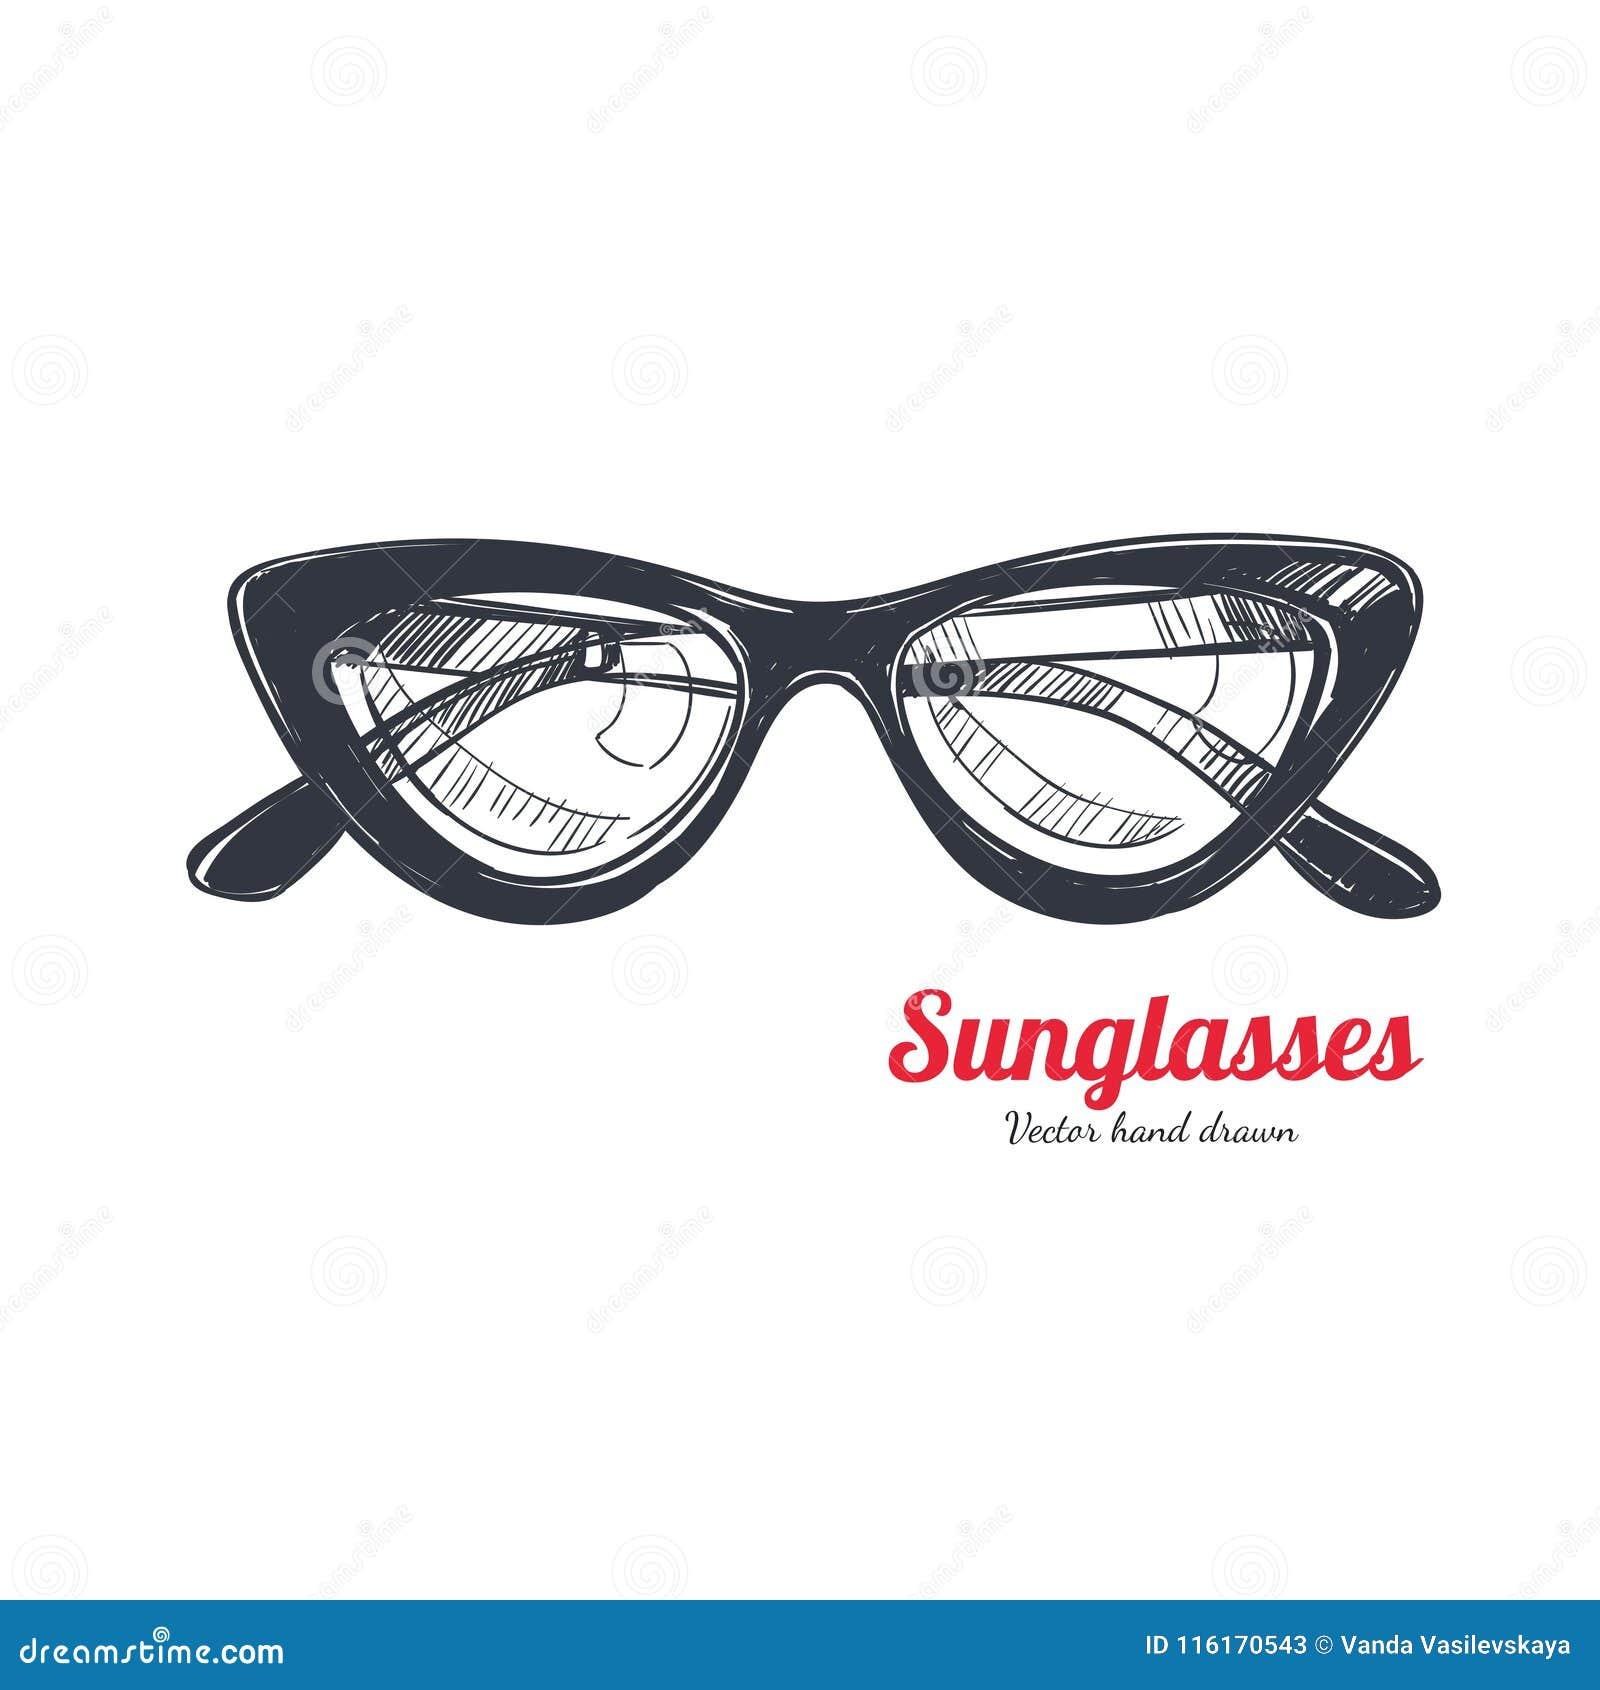 3a216c28f31 Cat eye glasses vector stock vector. Illustration of elegant - 116170543